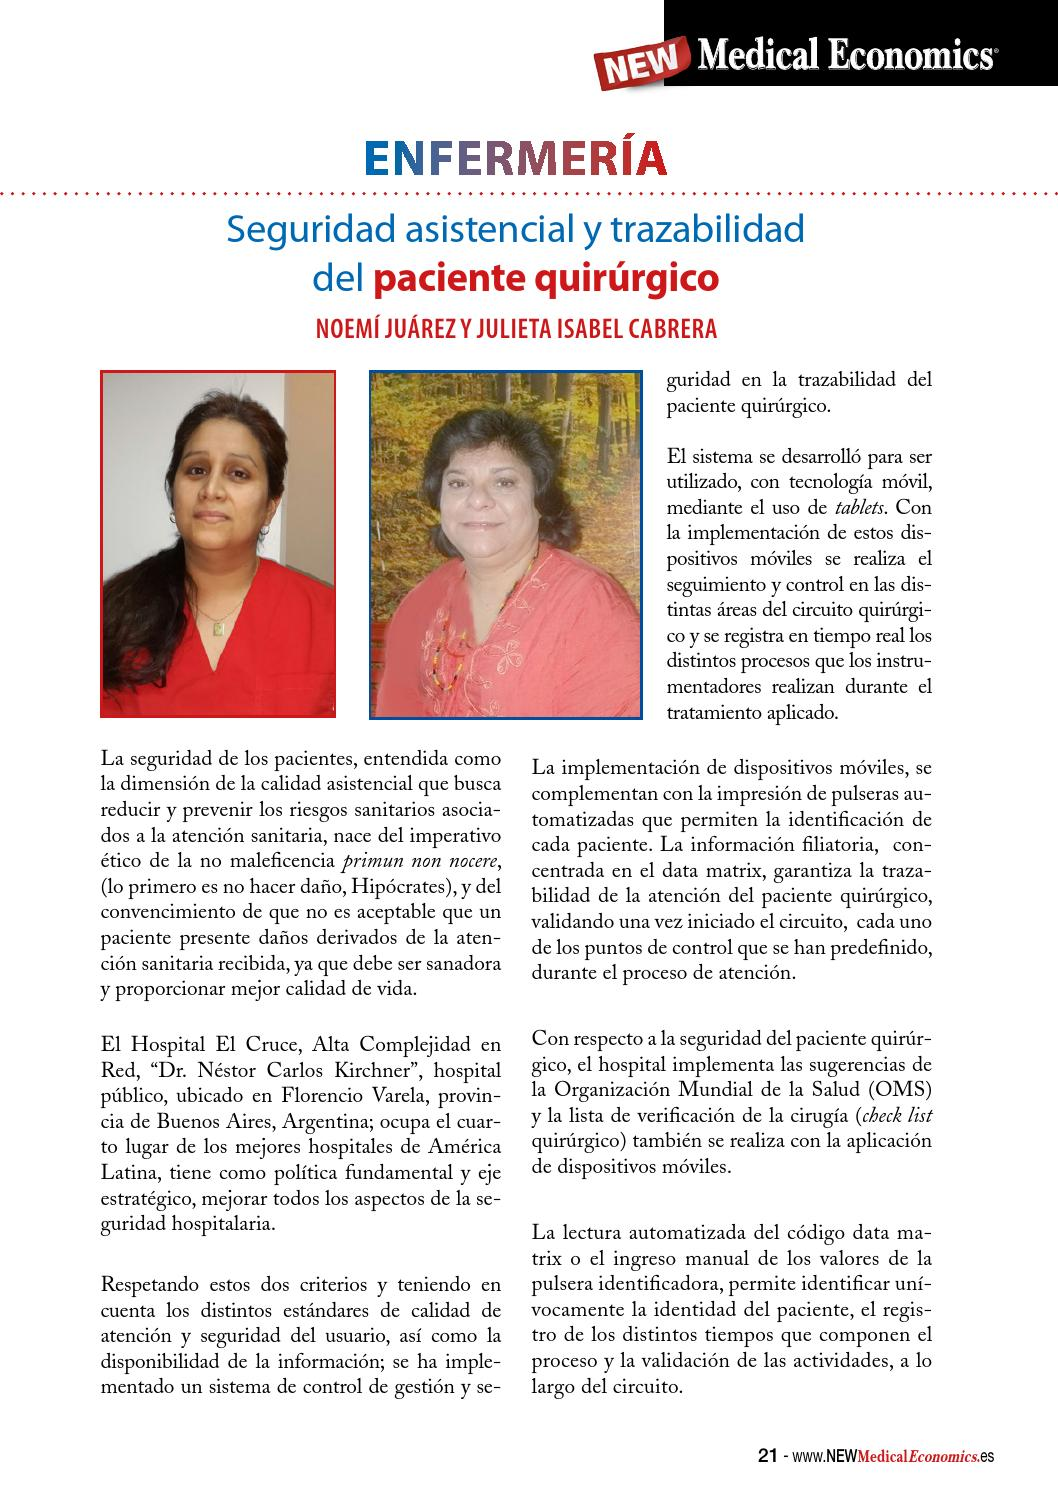 Circuito Quirurgico : Nº 22 new medical economics by raíz issuu